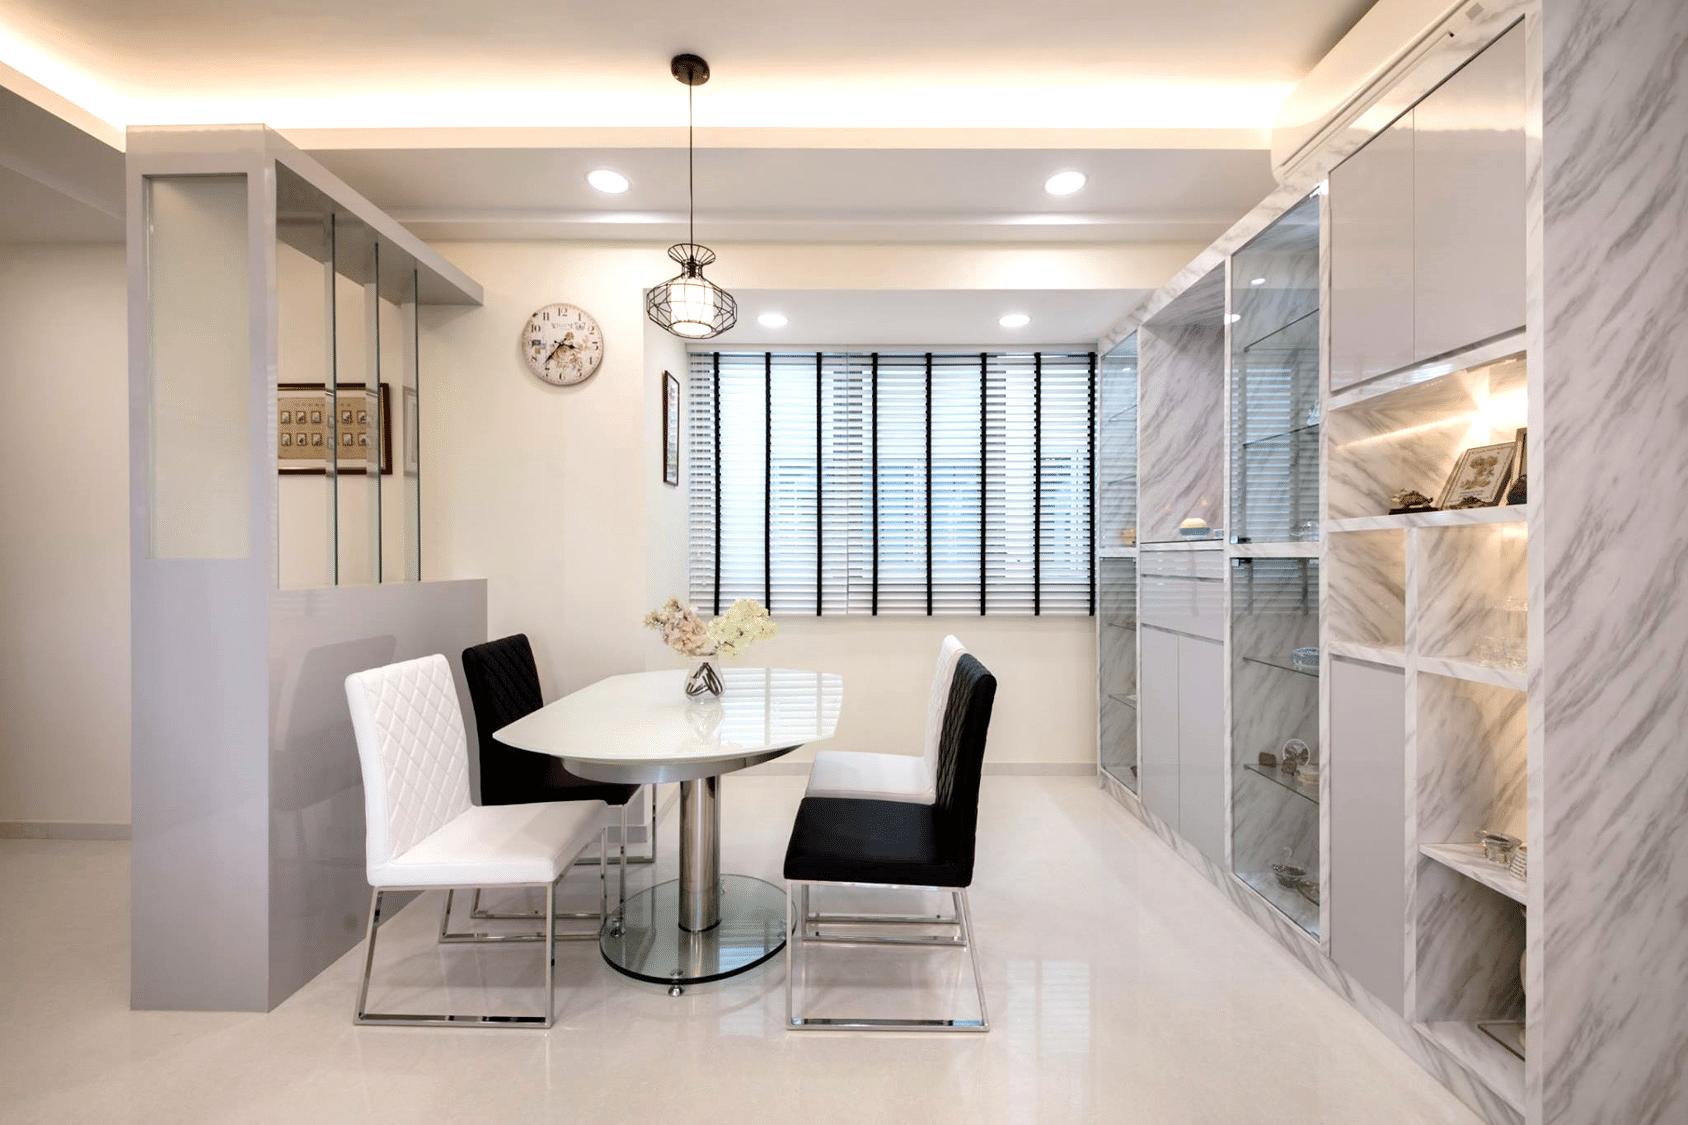 Home room interior design and custom carpentry singapore Clean modern interior design